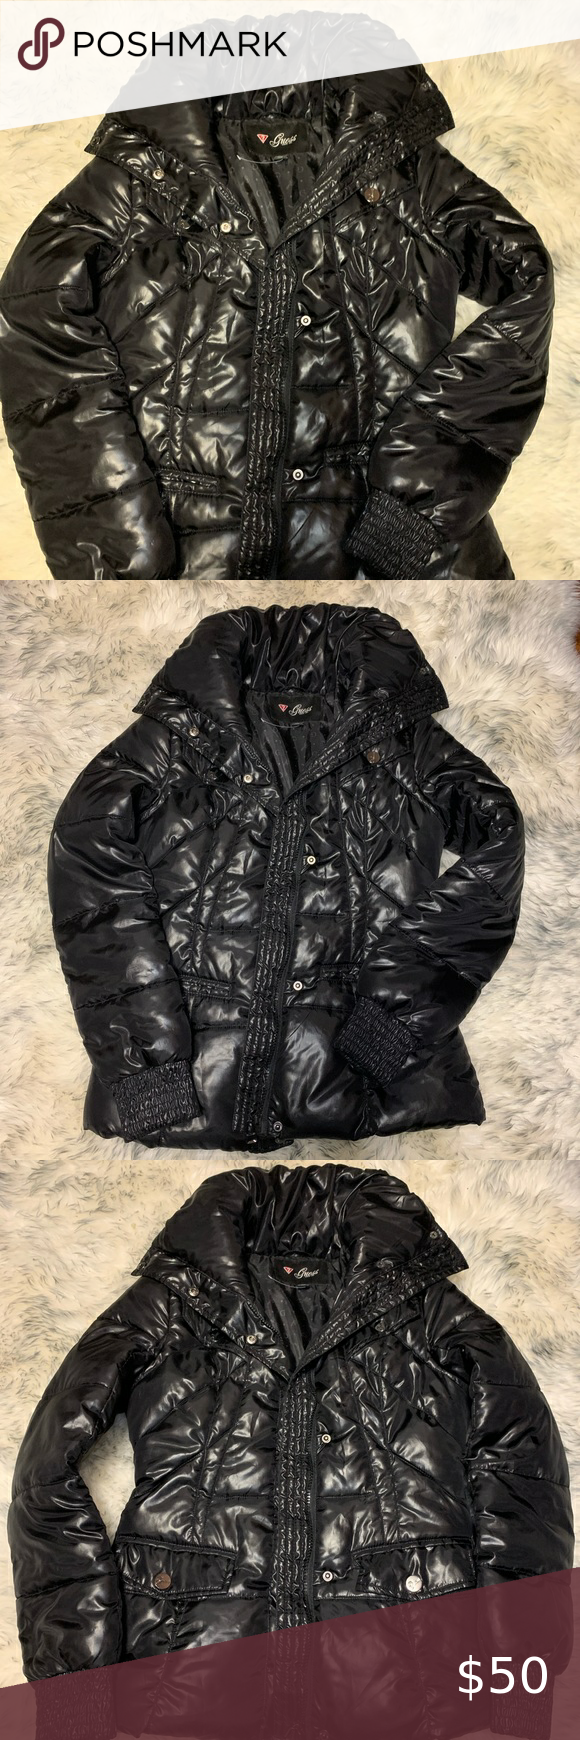 Guess Black Puffer Coat Jacket Small Black Puffer Black Puffer Coat Puffer Coat [ 1740 x 580 Pixel ]